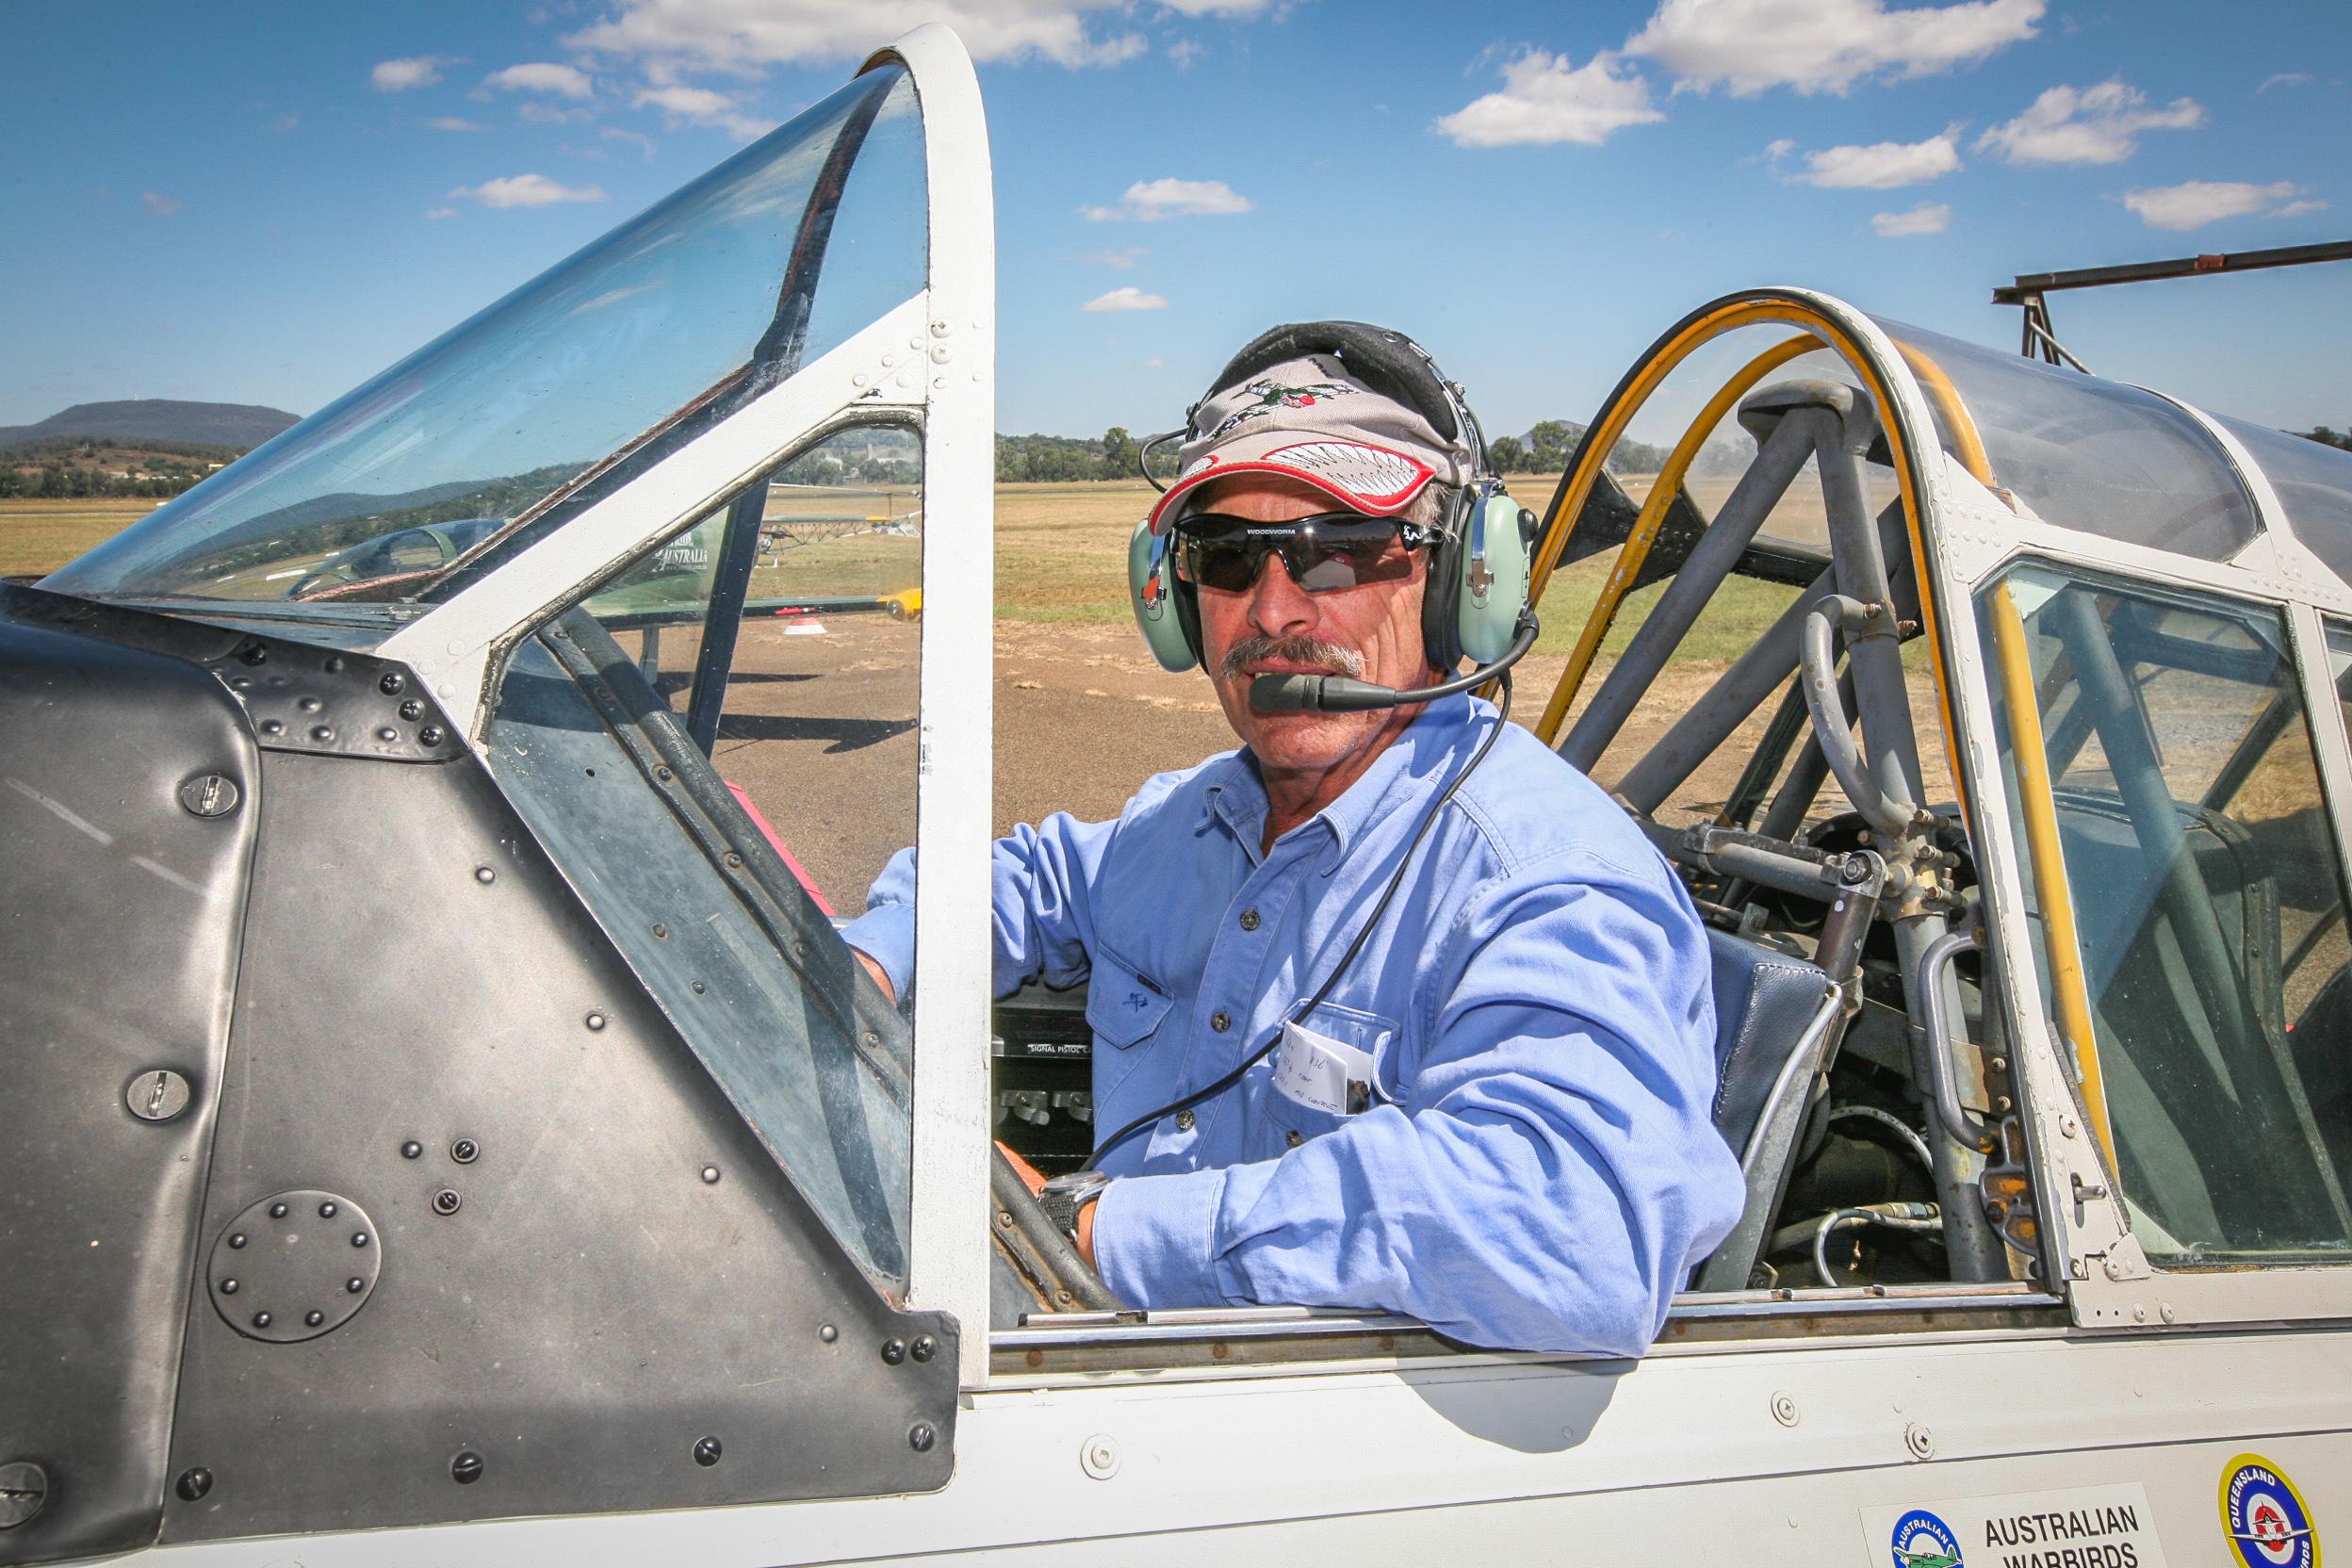 IMG_2542 - Phil Buckley photo - Gunnedah Air Show - March 14, 2015